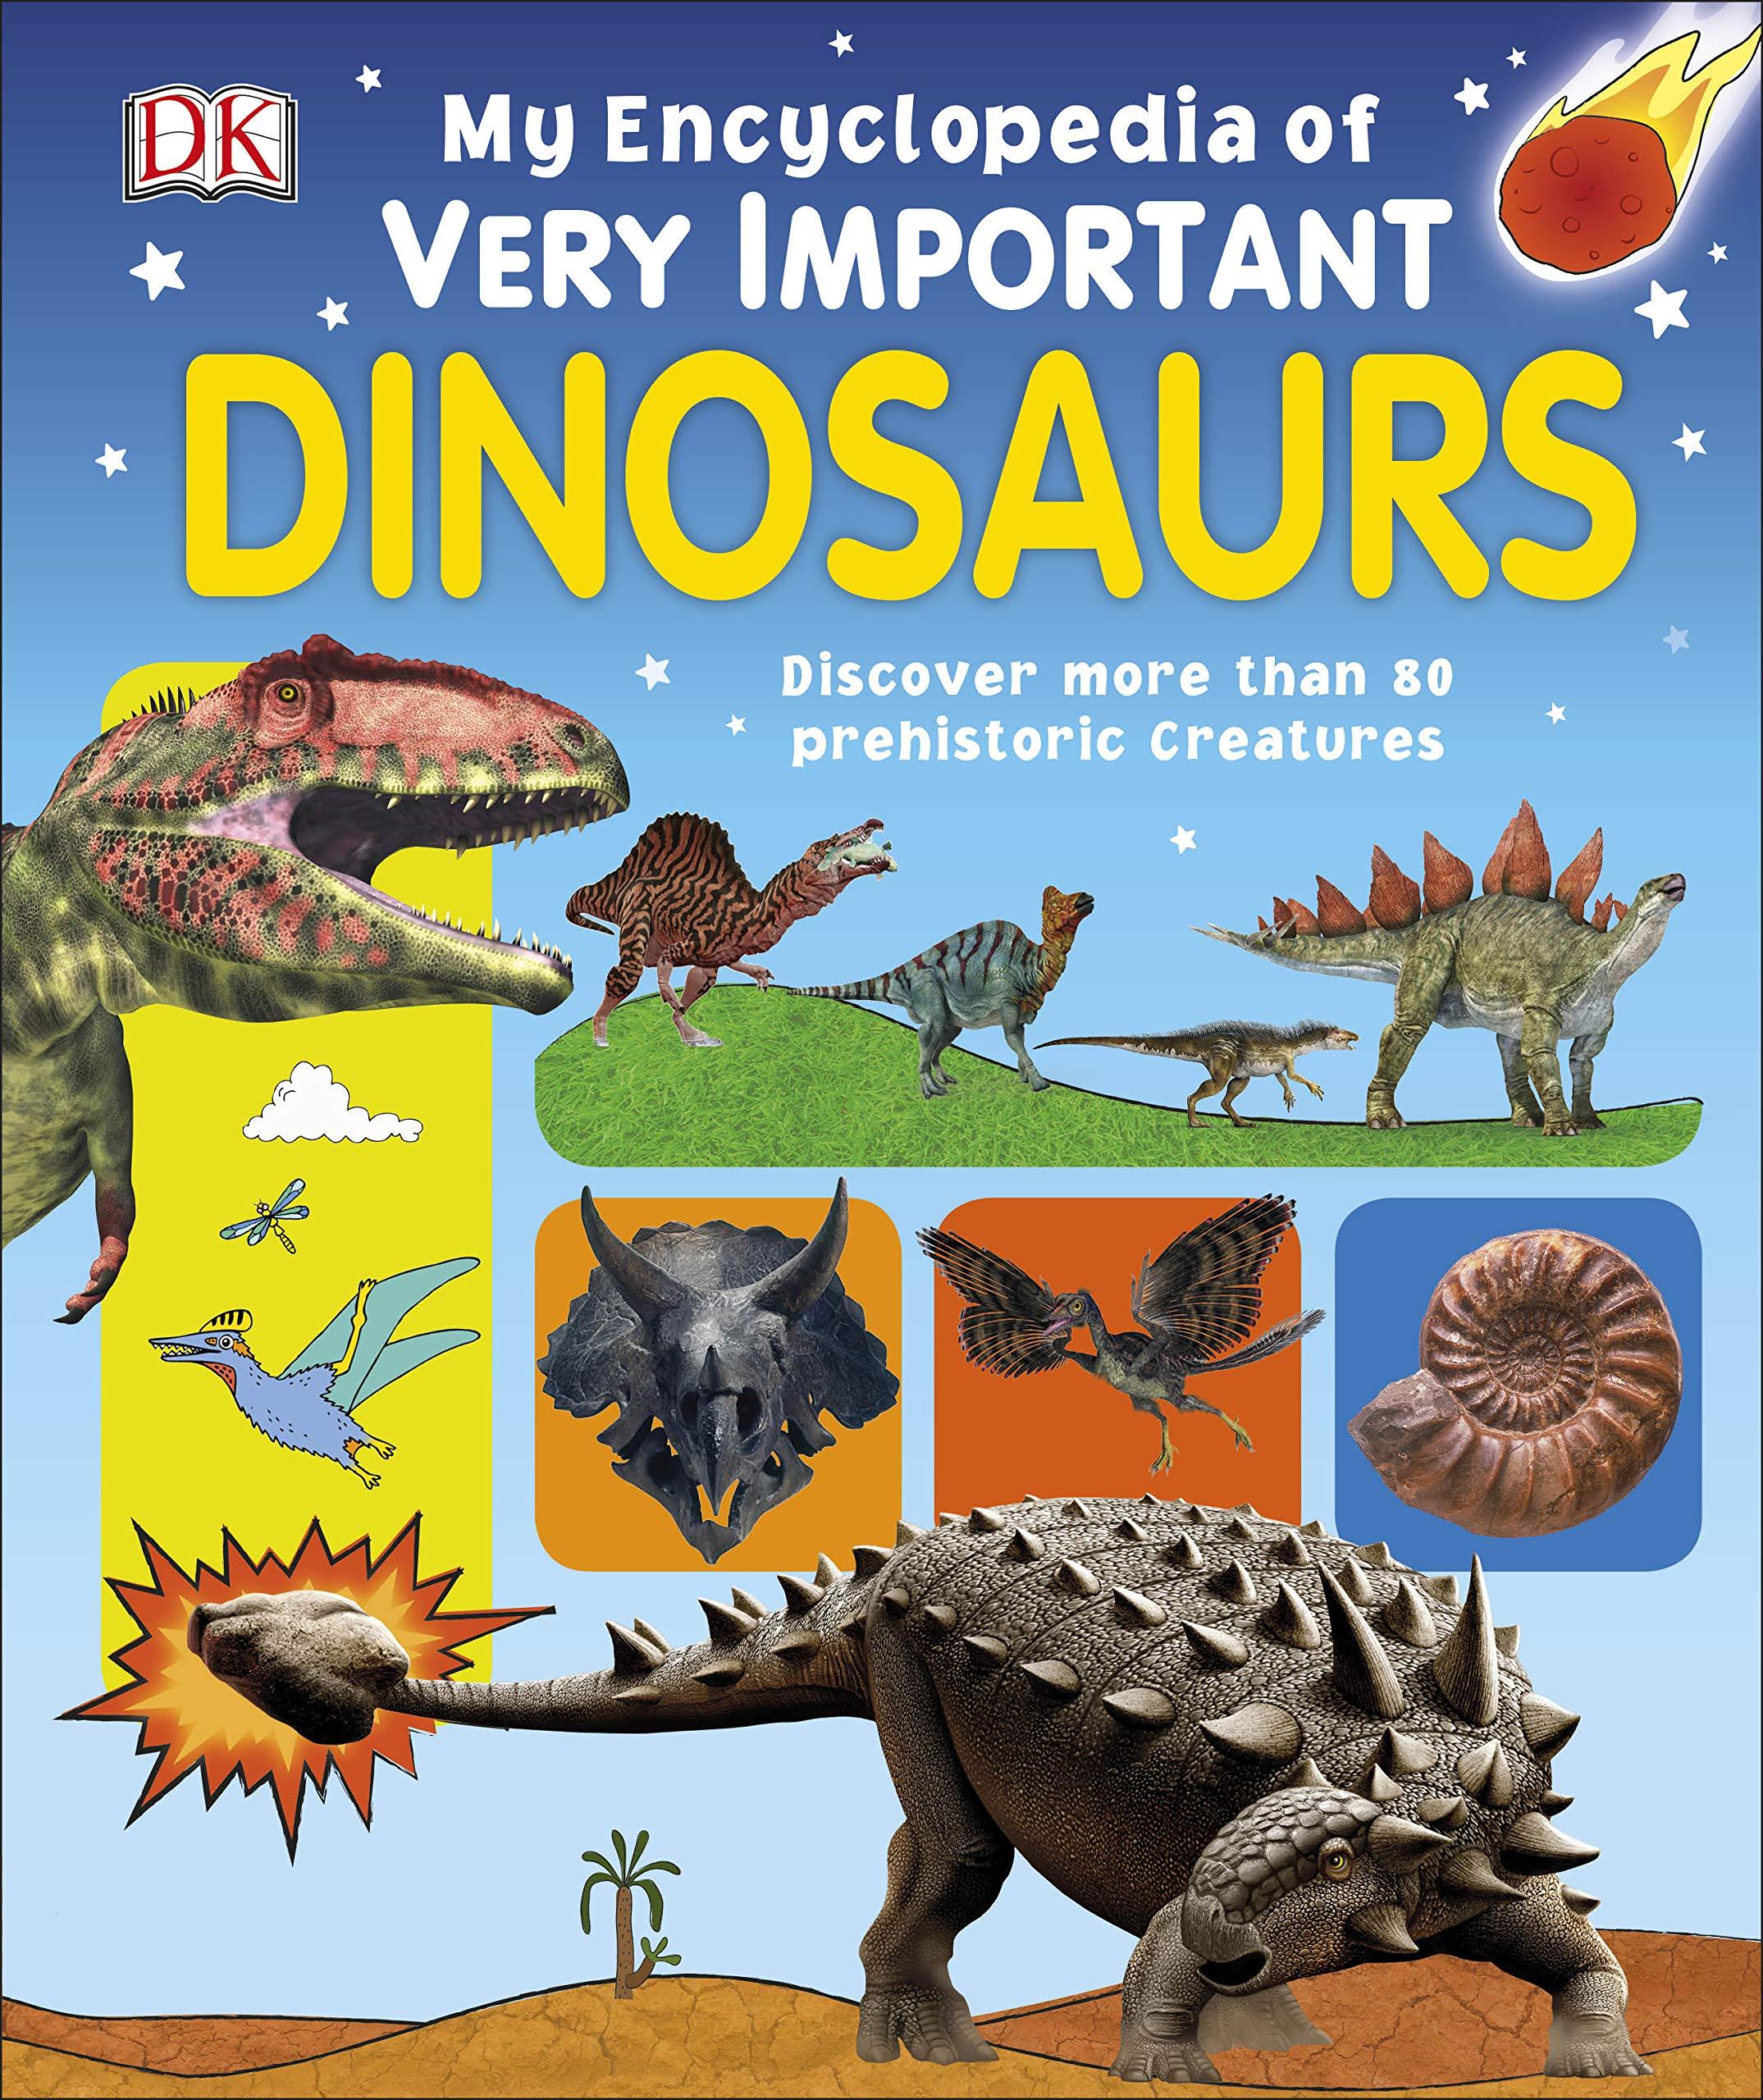 Encyclopedia Very Important Dinosaurs Encyclopedias product image